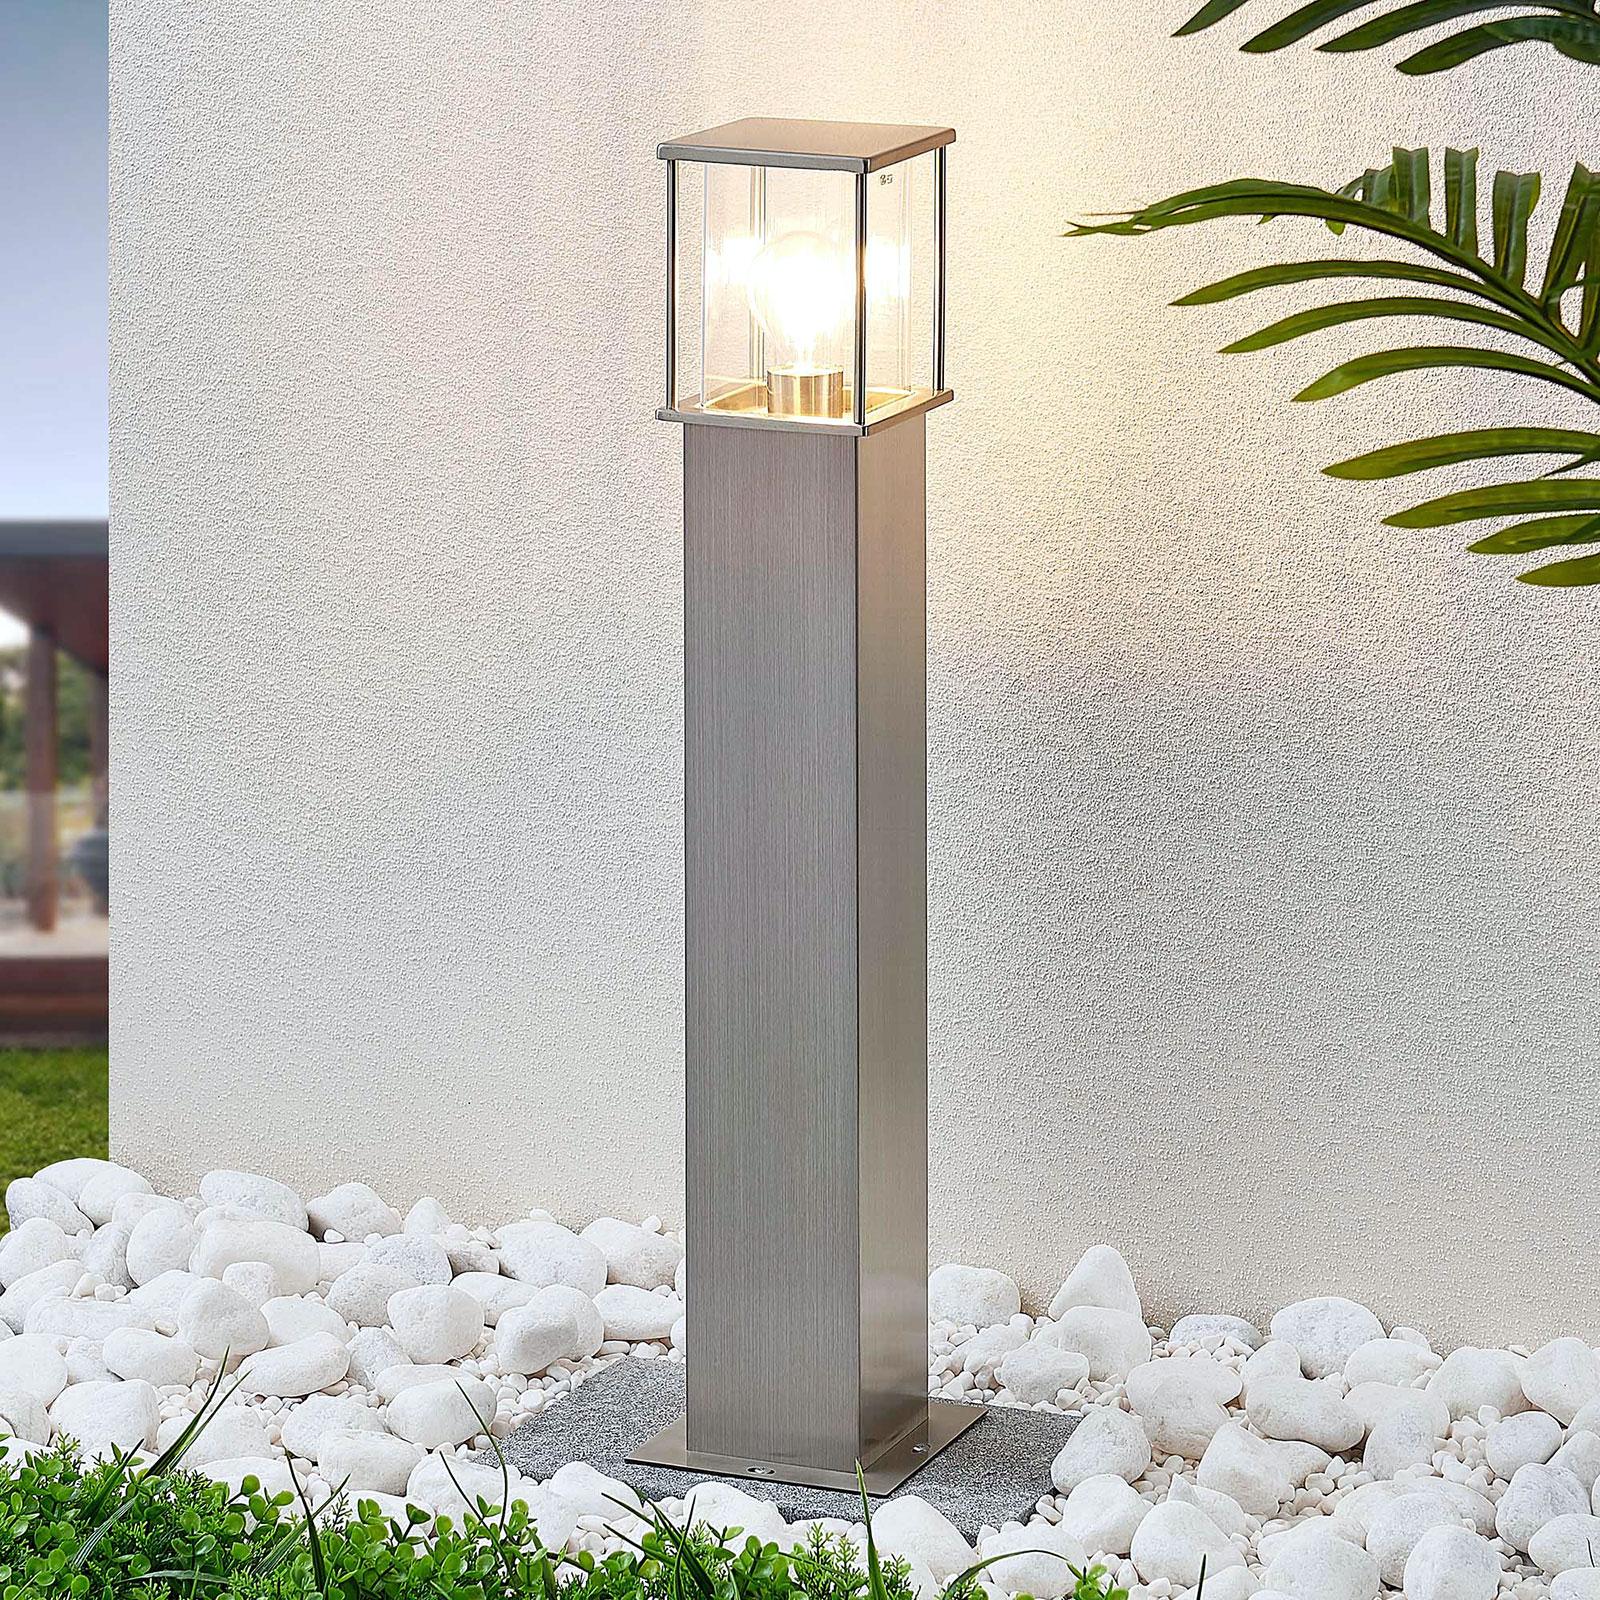 Edelstahl-Wegelampe Caspa, eckig